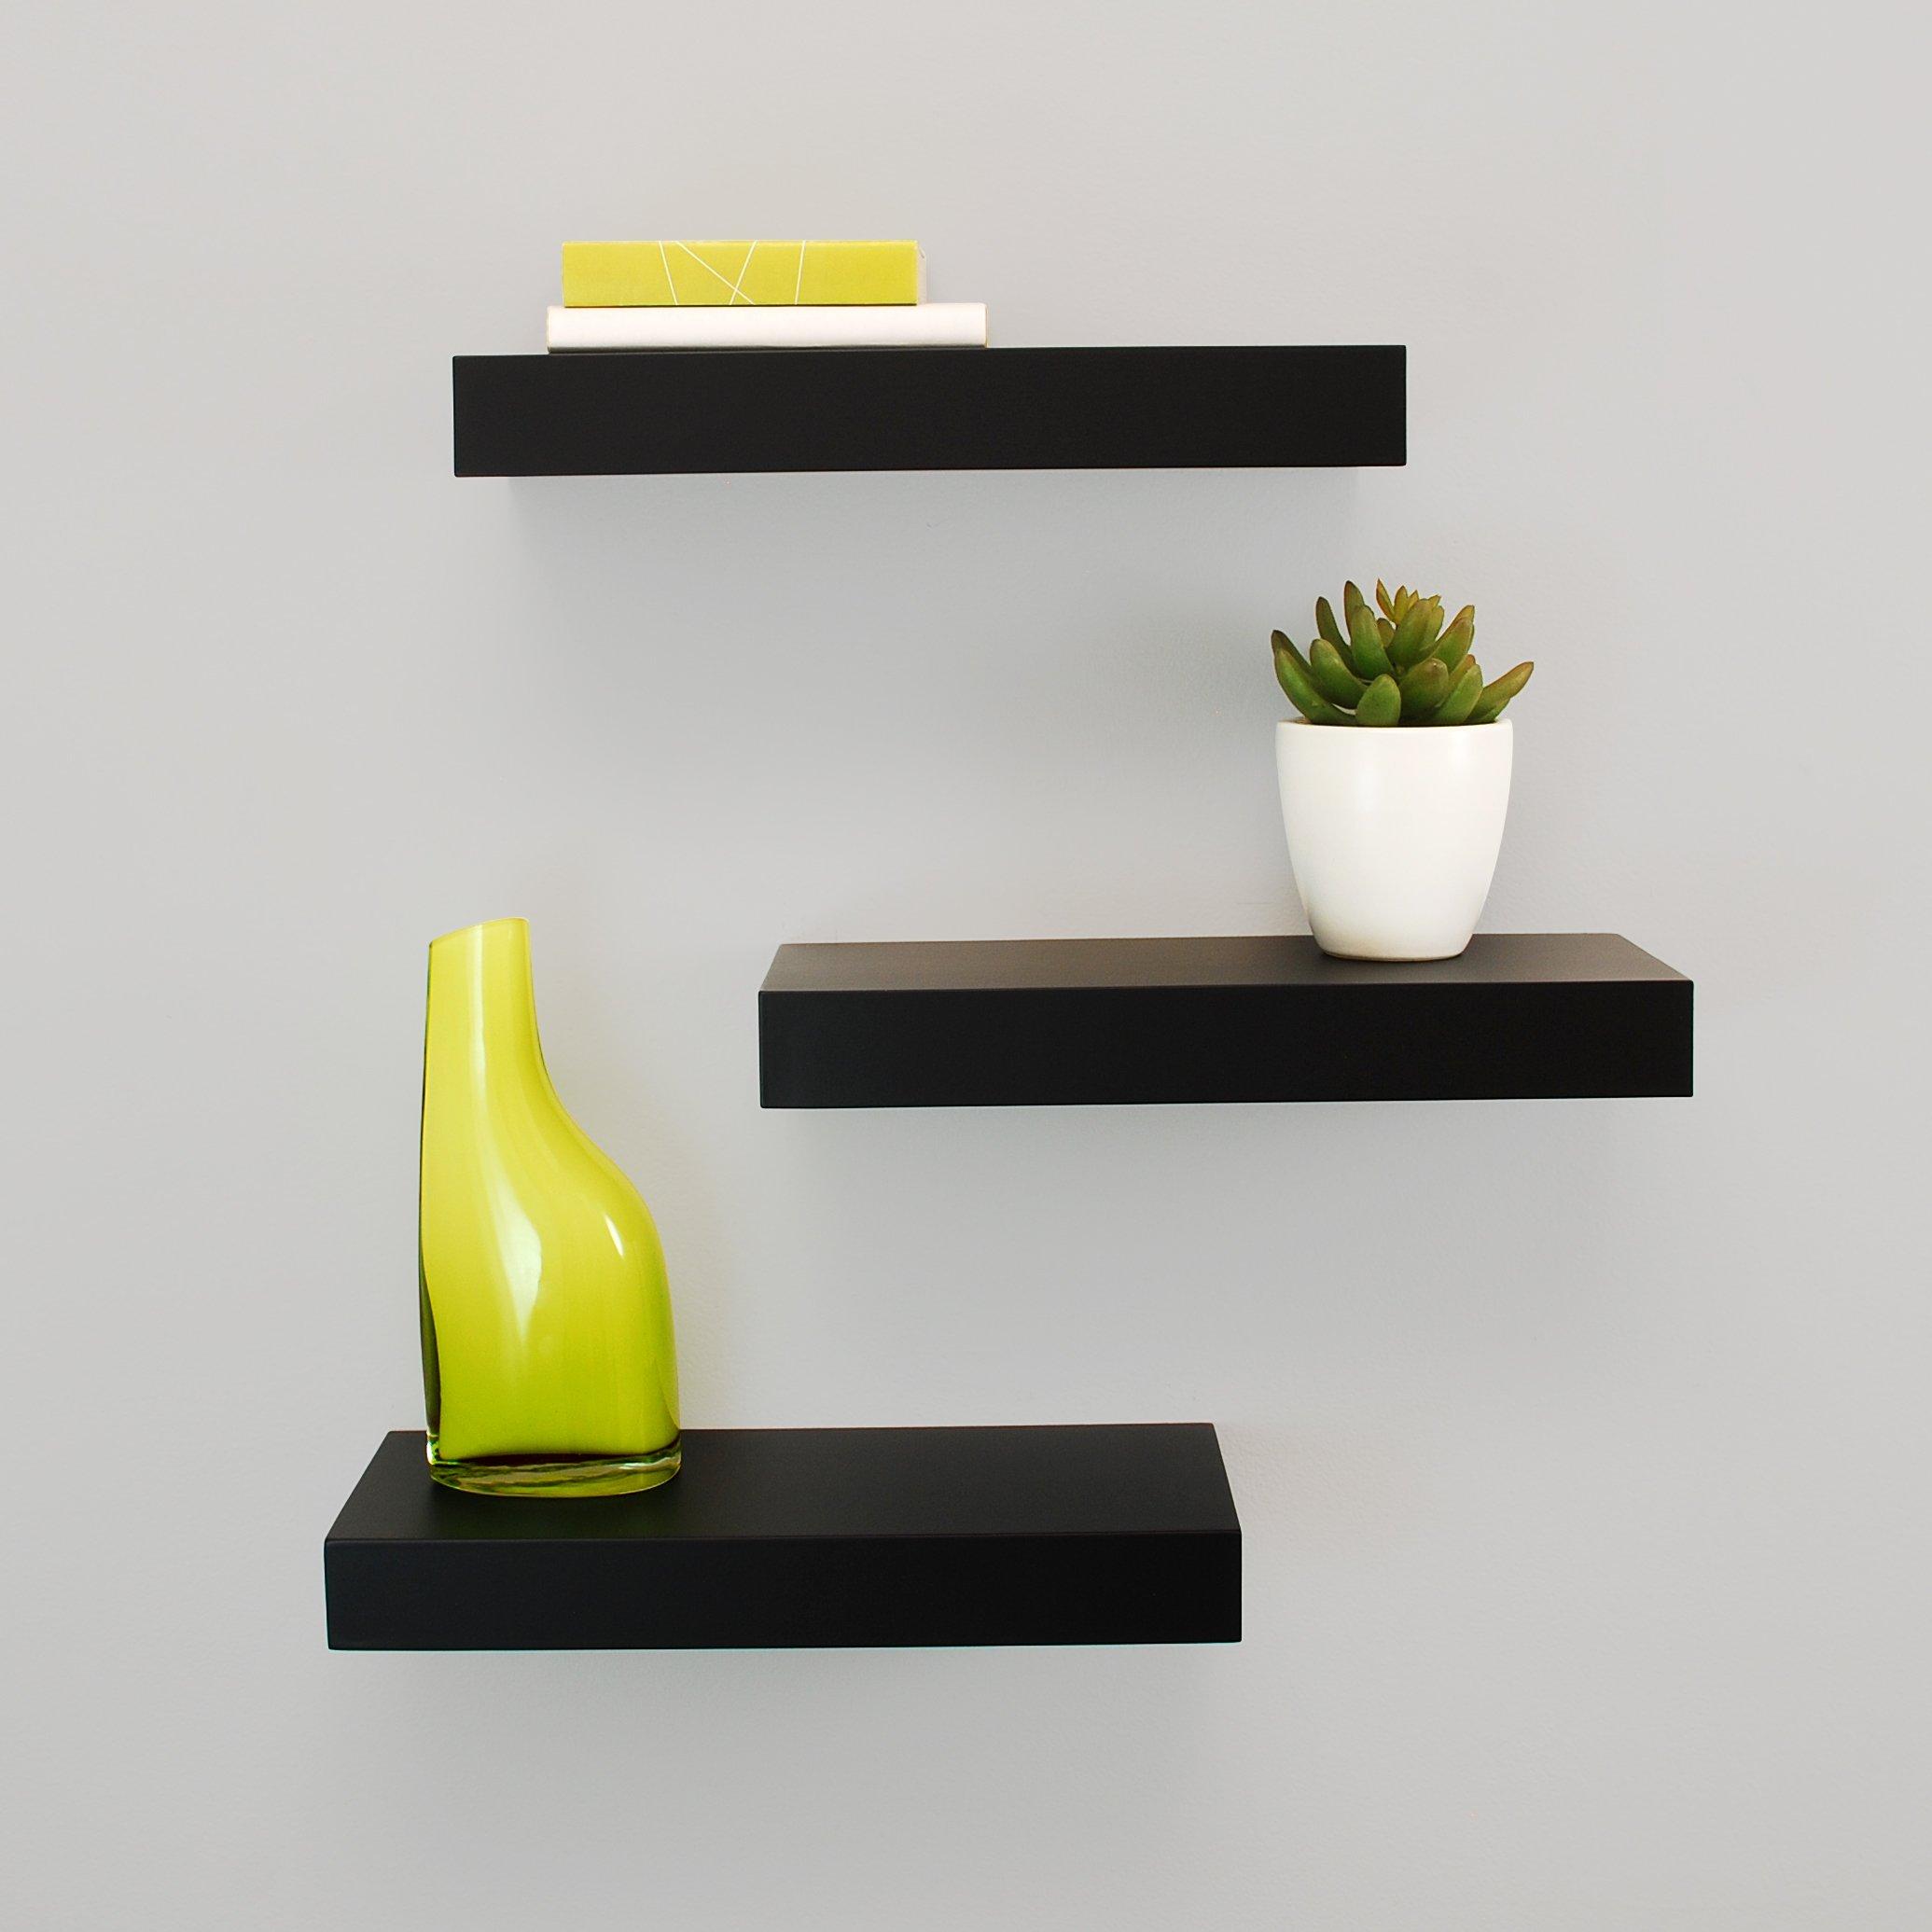 Kiera Grace Maine Wall Shelf, 12-Inch, Pack of 3, Black